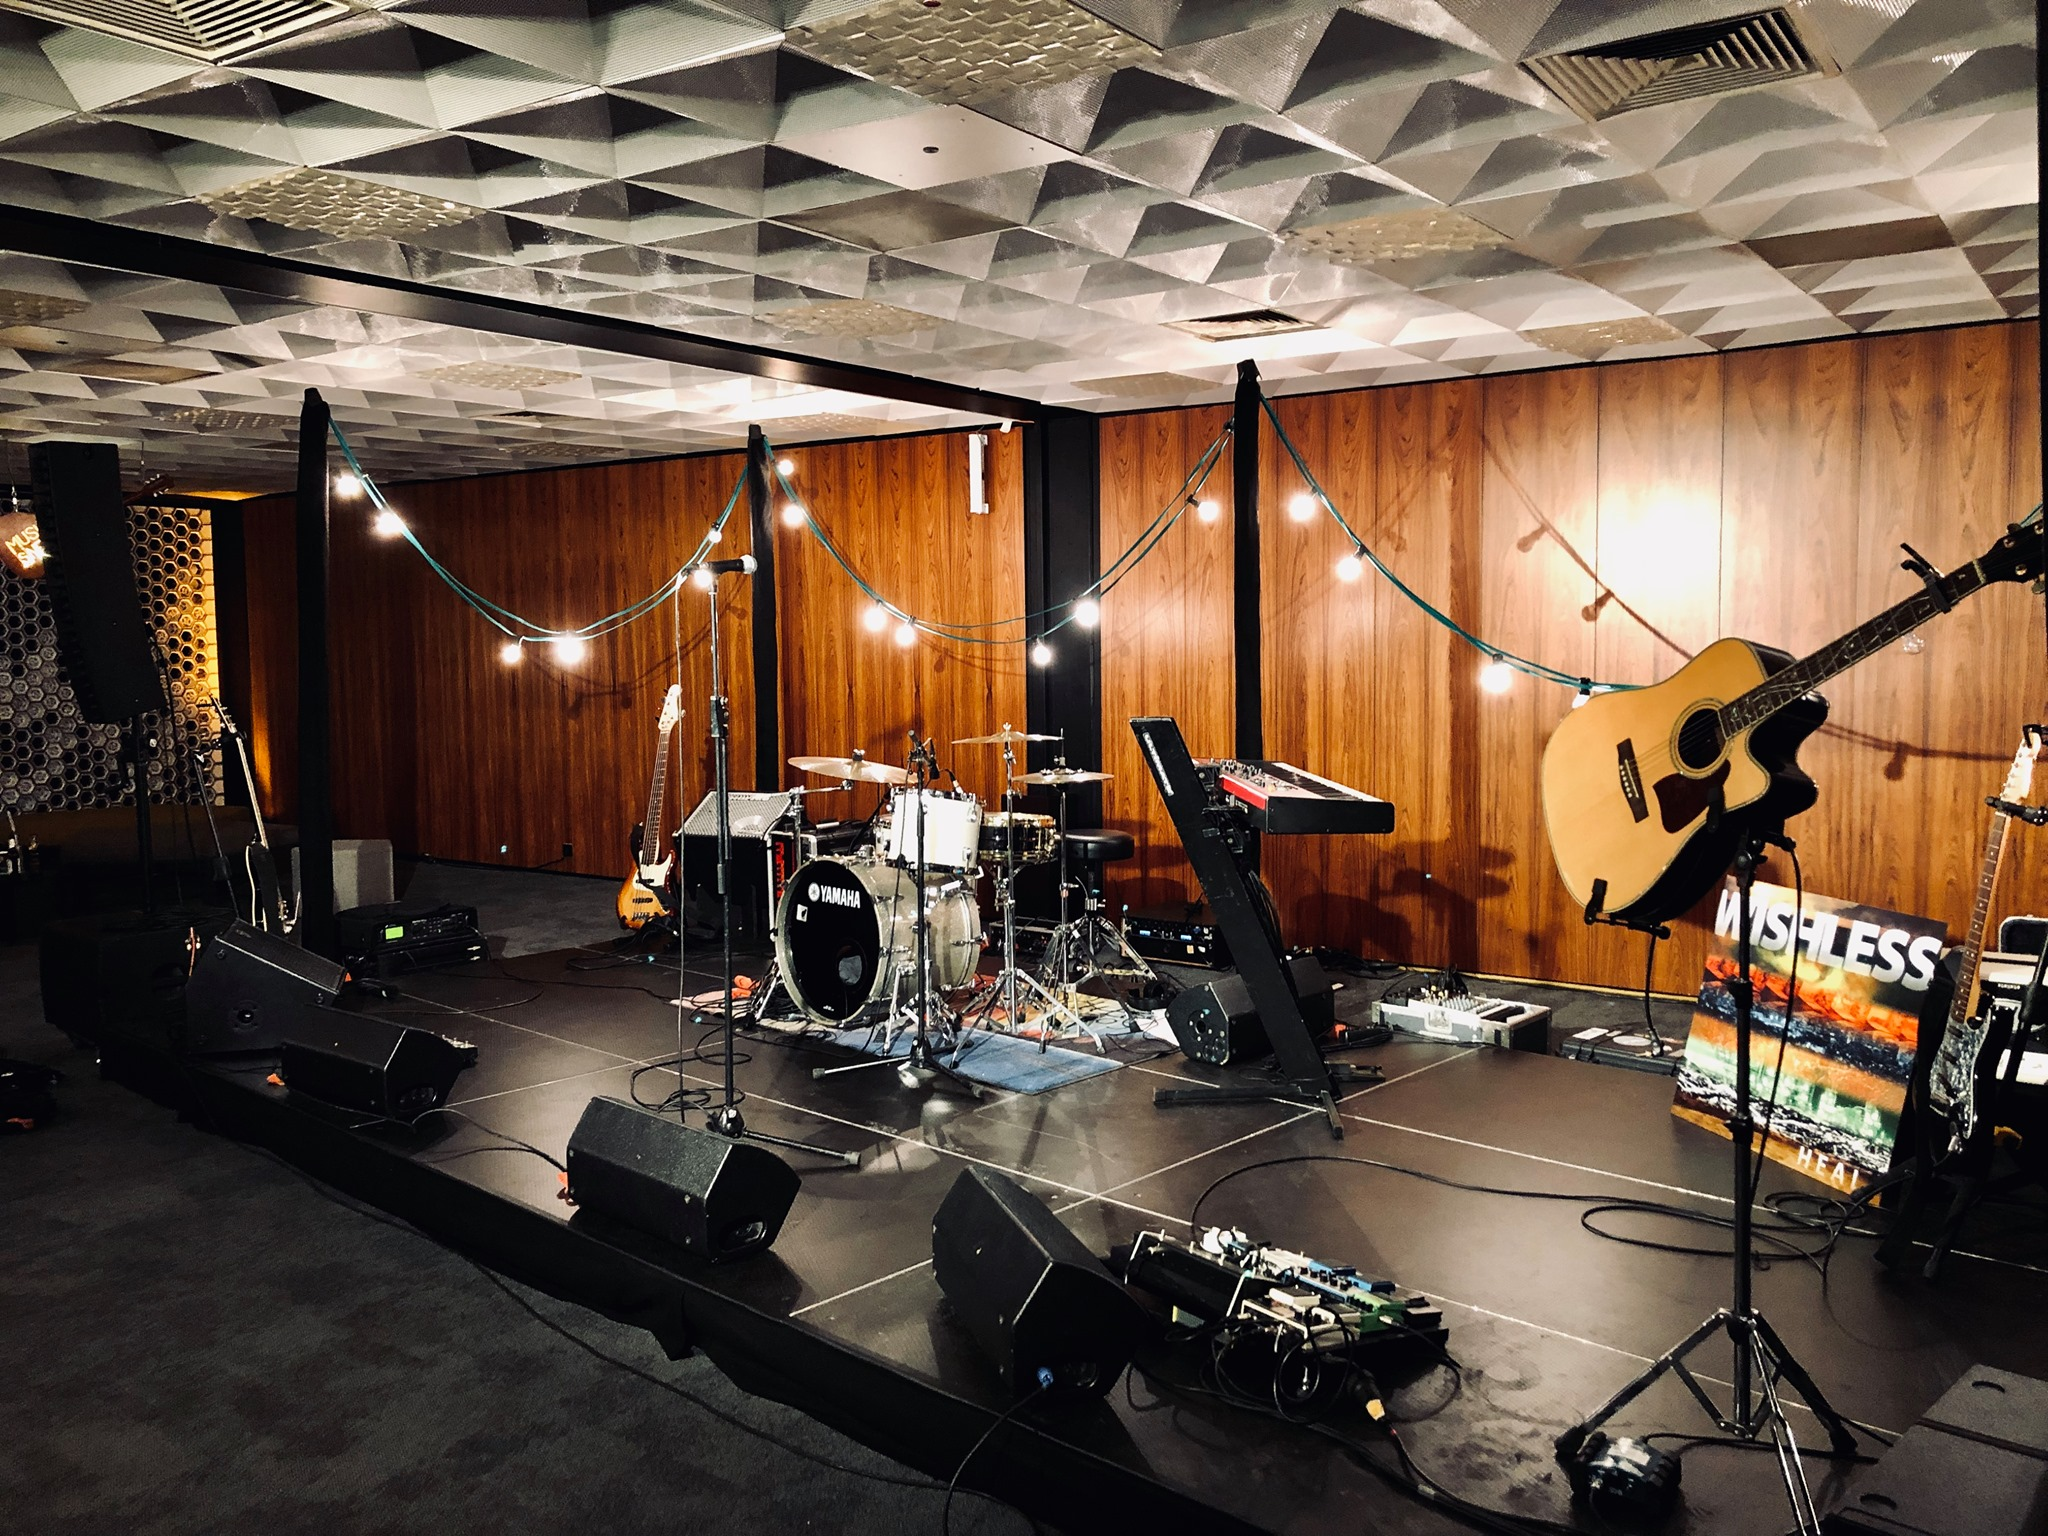 Music Sneak - Jahrhunderthalle (Frankfurt)